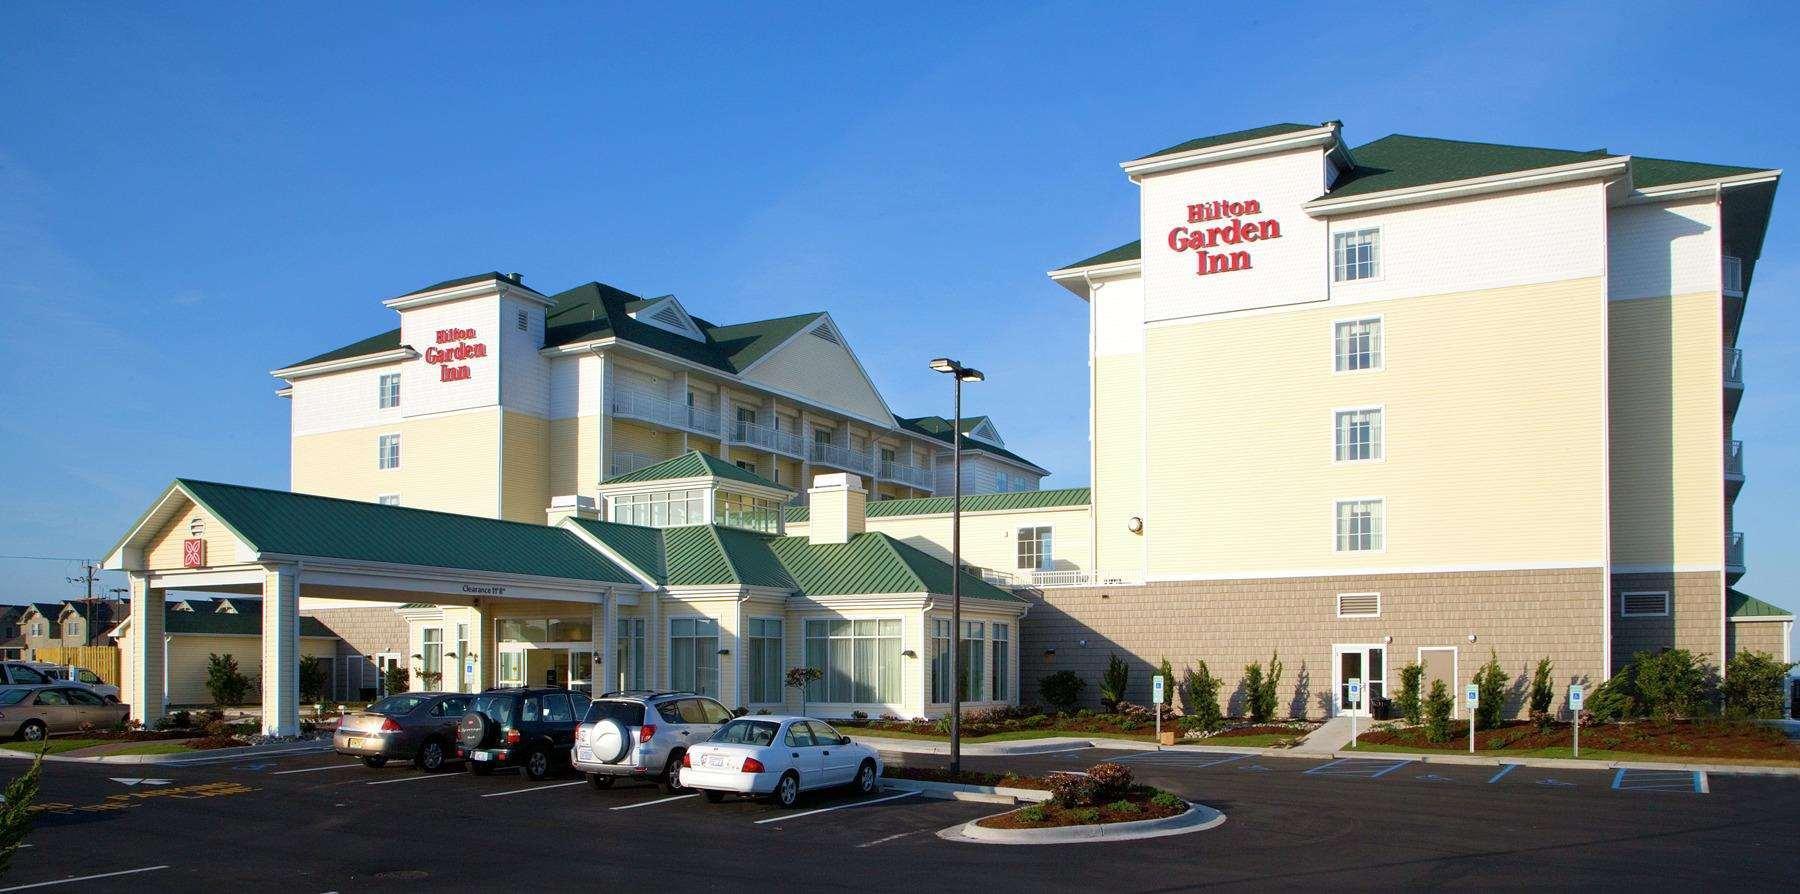 Hilton Garden Inn Outer Banks Kitty Hawk